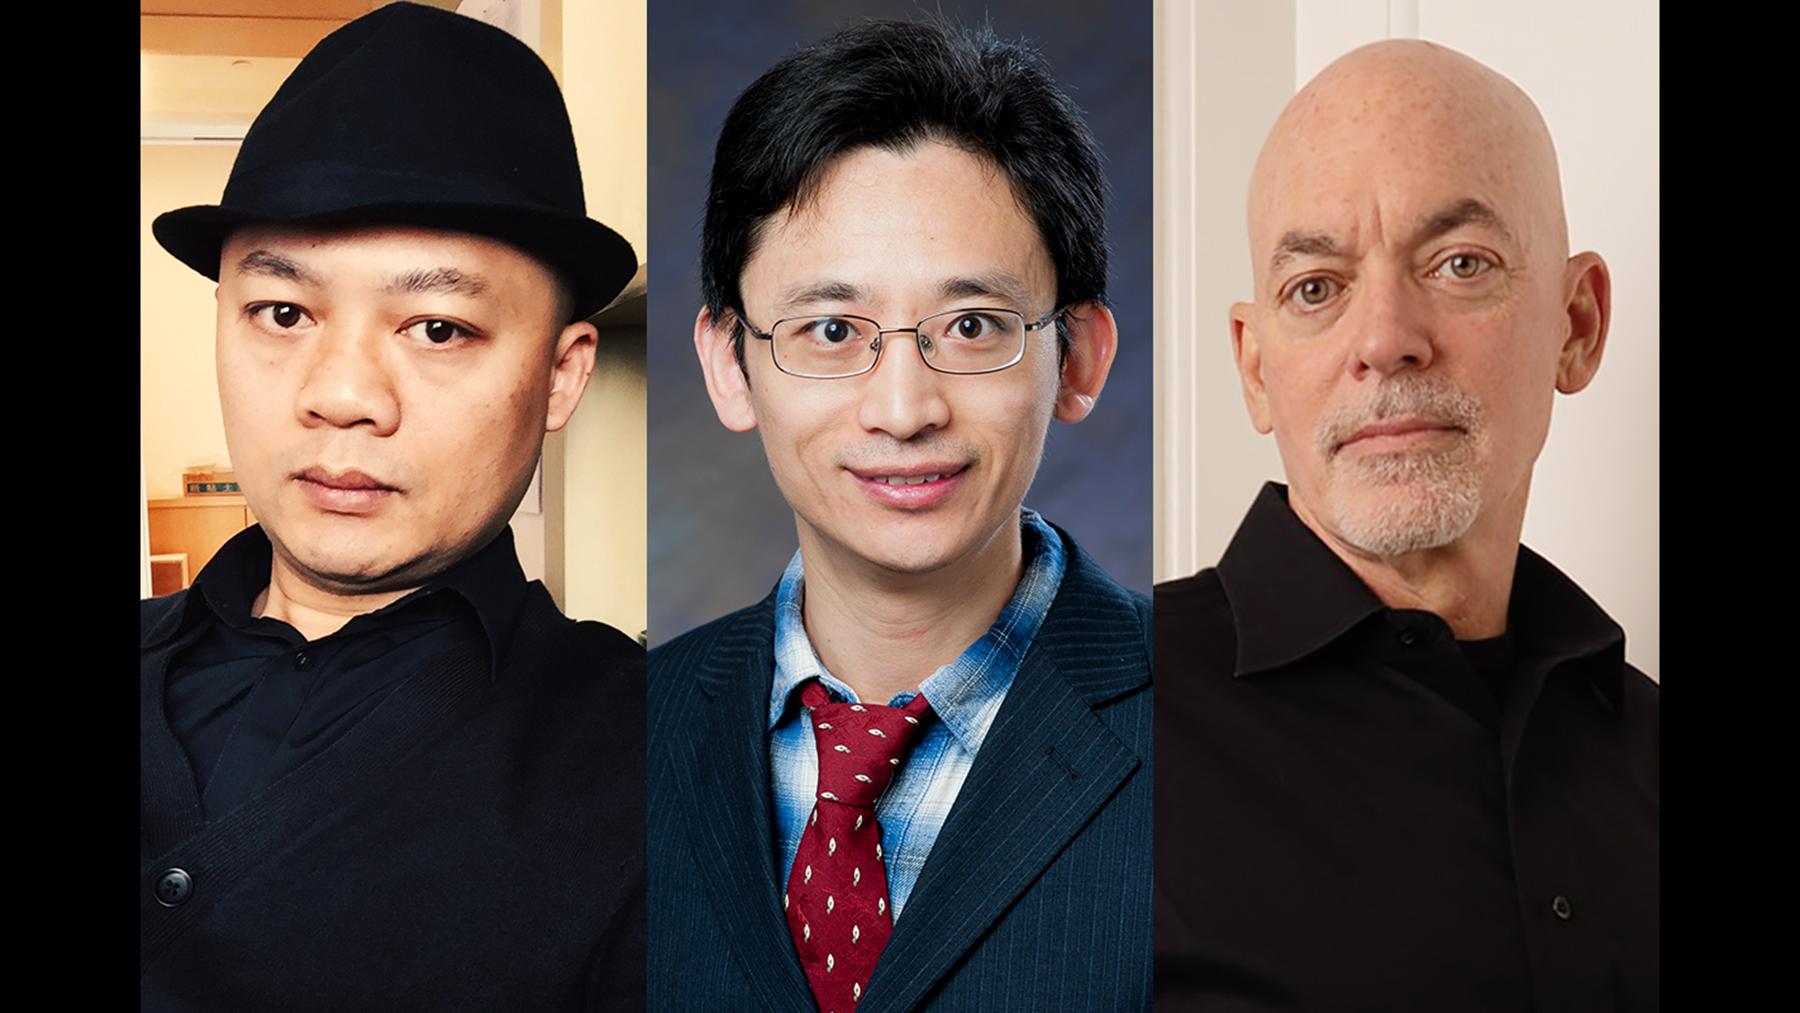 researchers Bin Jiang, Yi Lu and William Sullivan. Photos courtesy of subjects